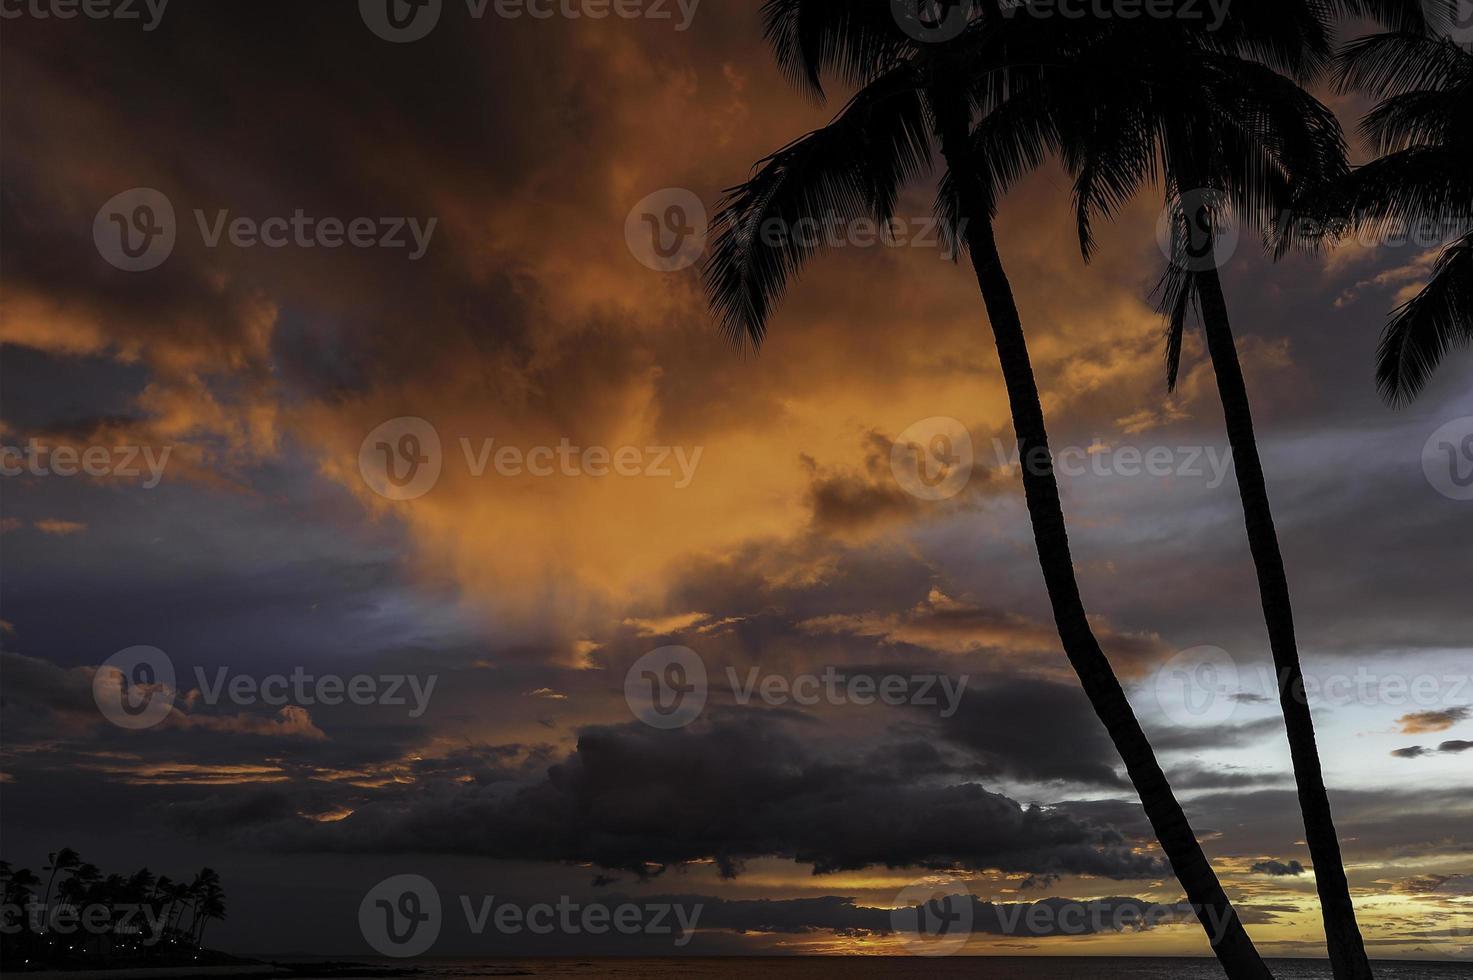 kailua-kona Sonnenuntergang foto